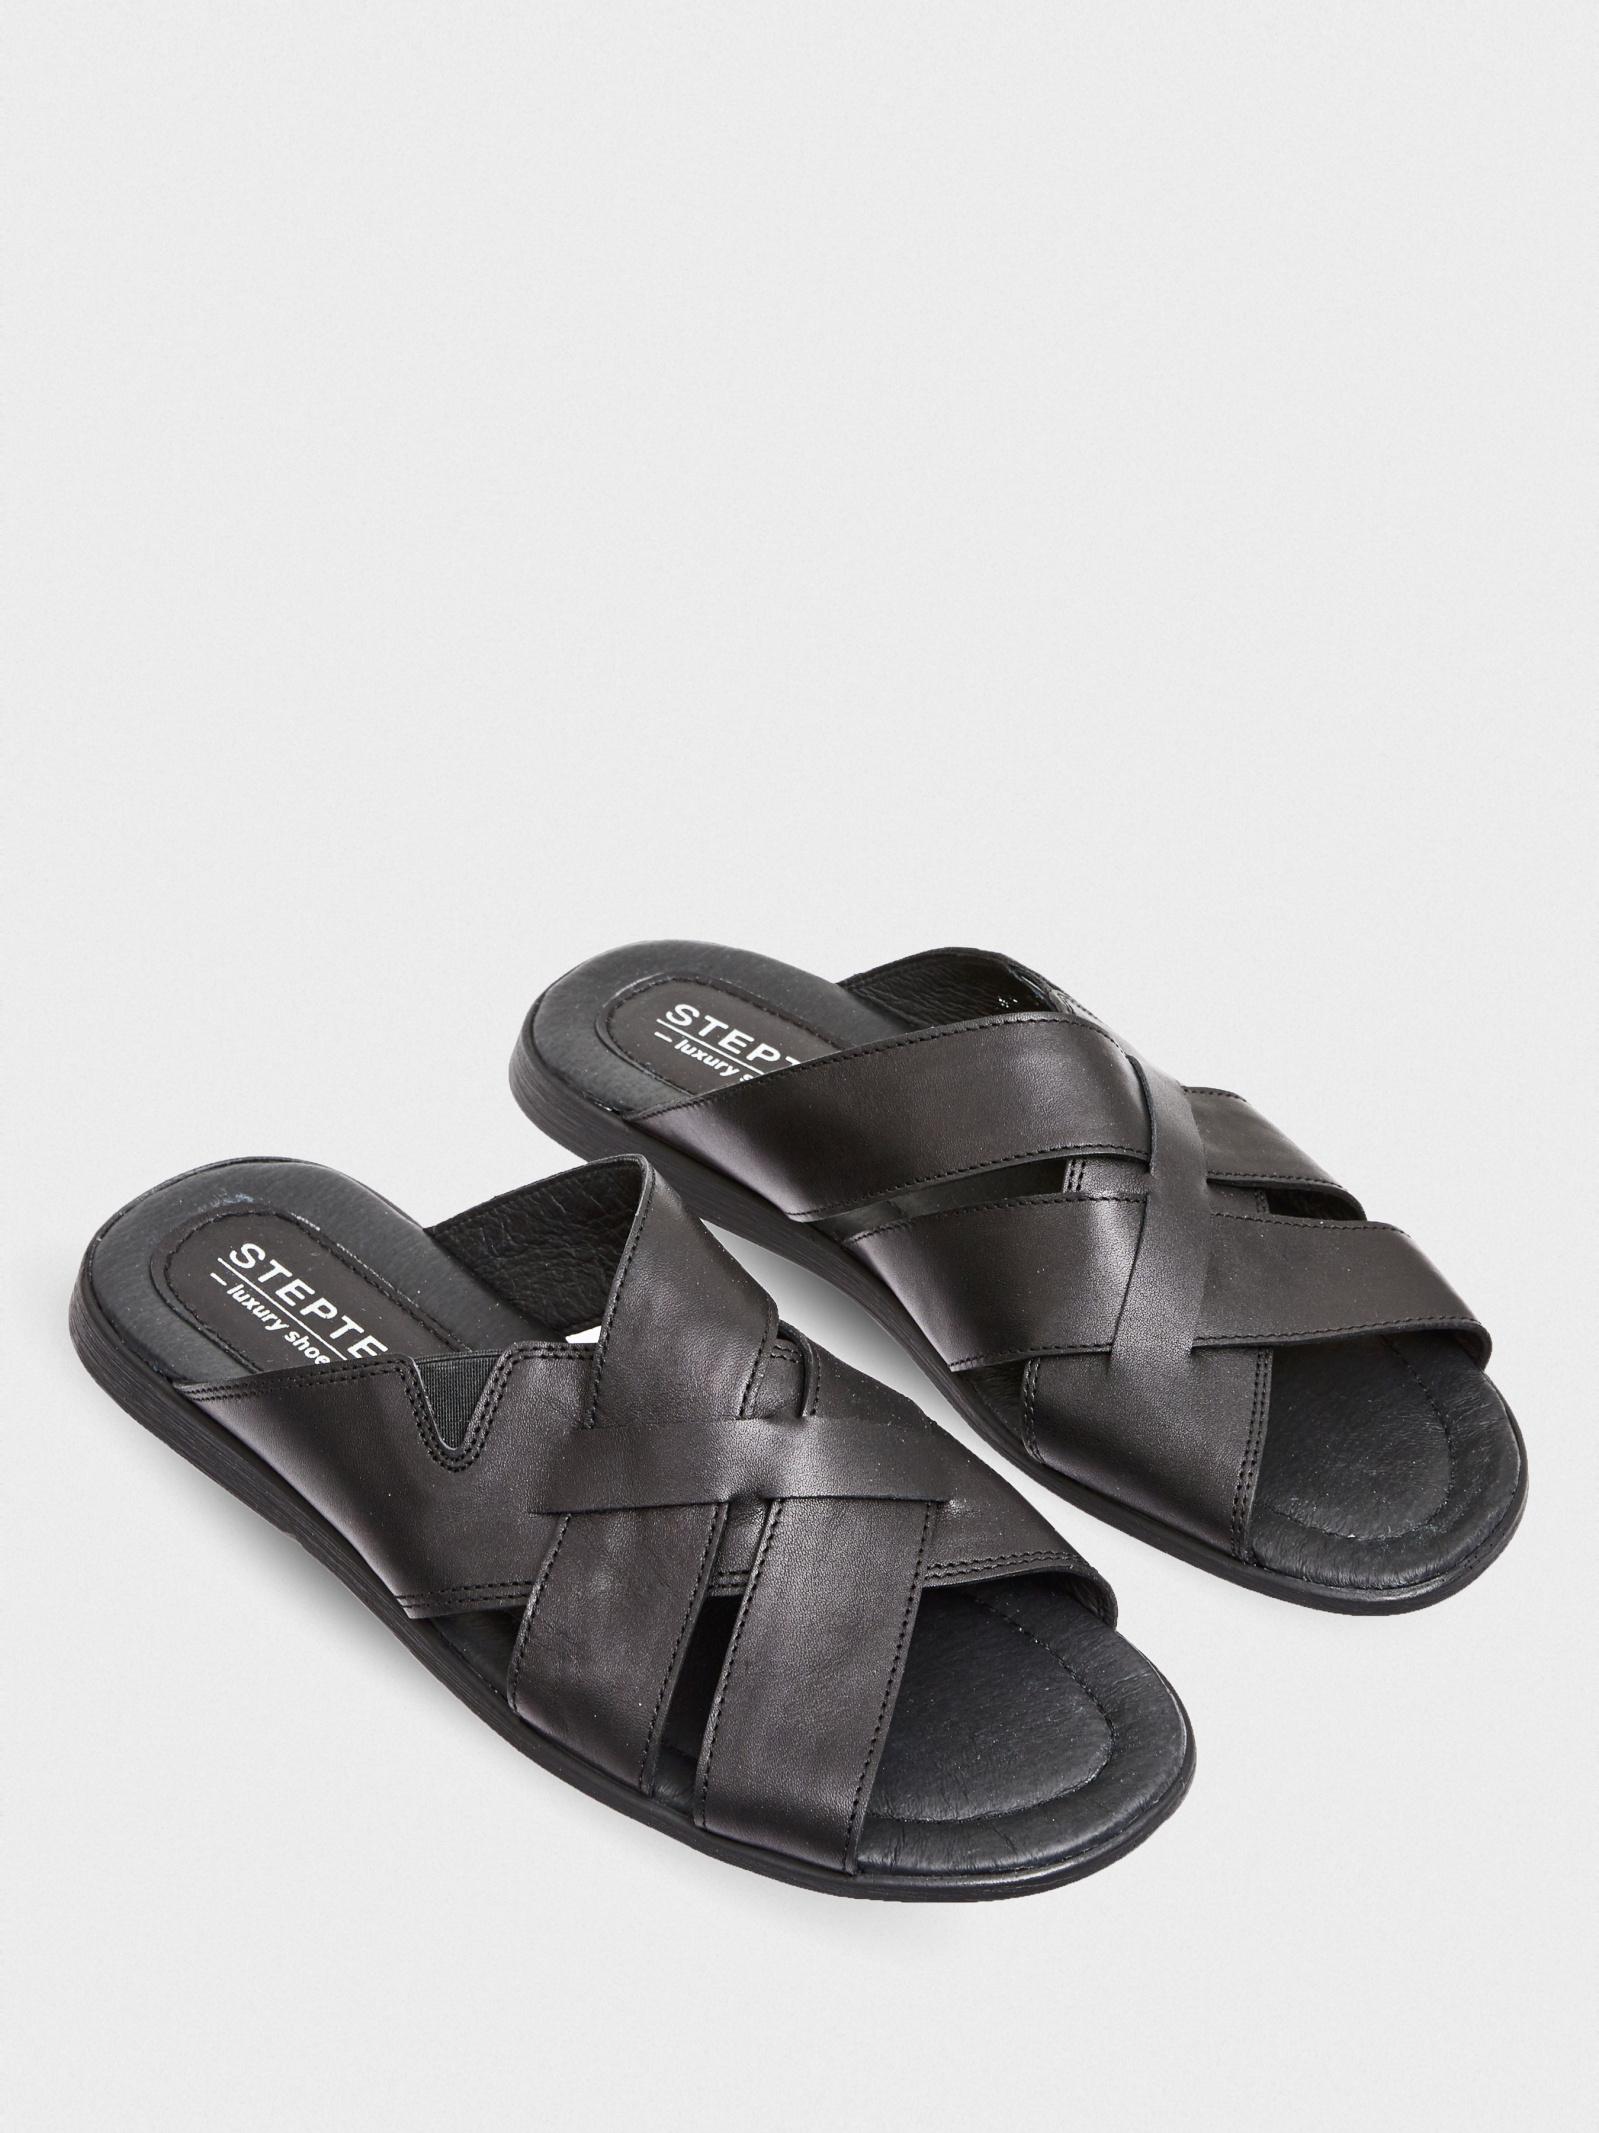 Шлёпанцы для мужчин Стептер 6953 размеры обуви, 2017